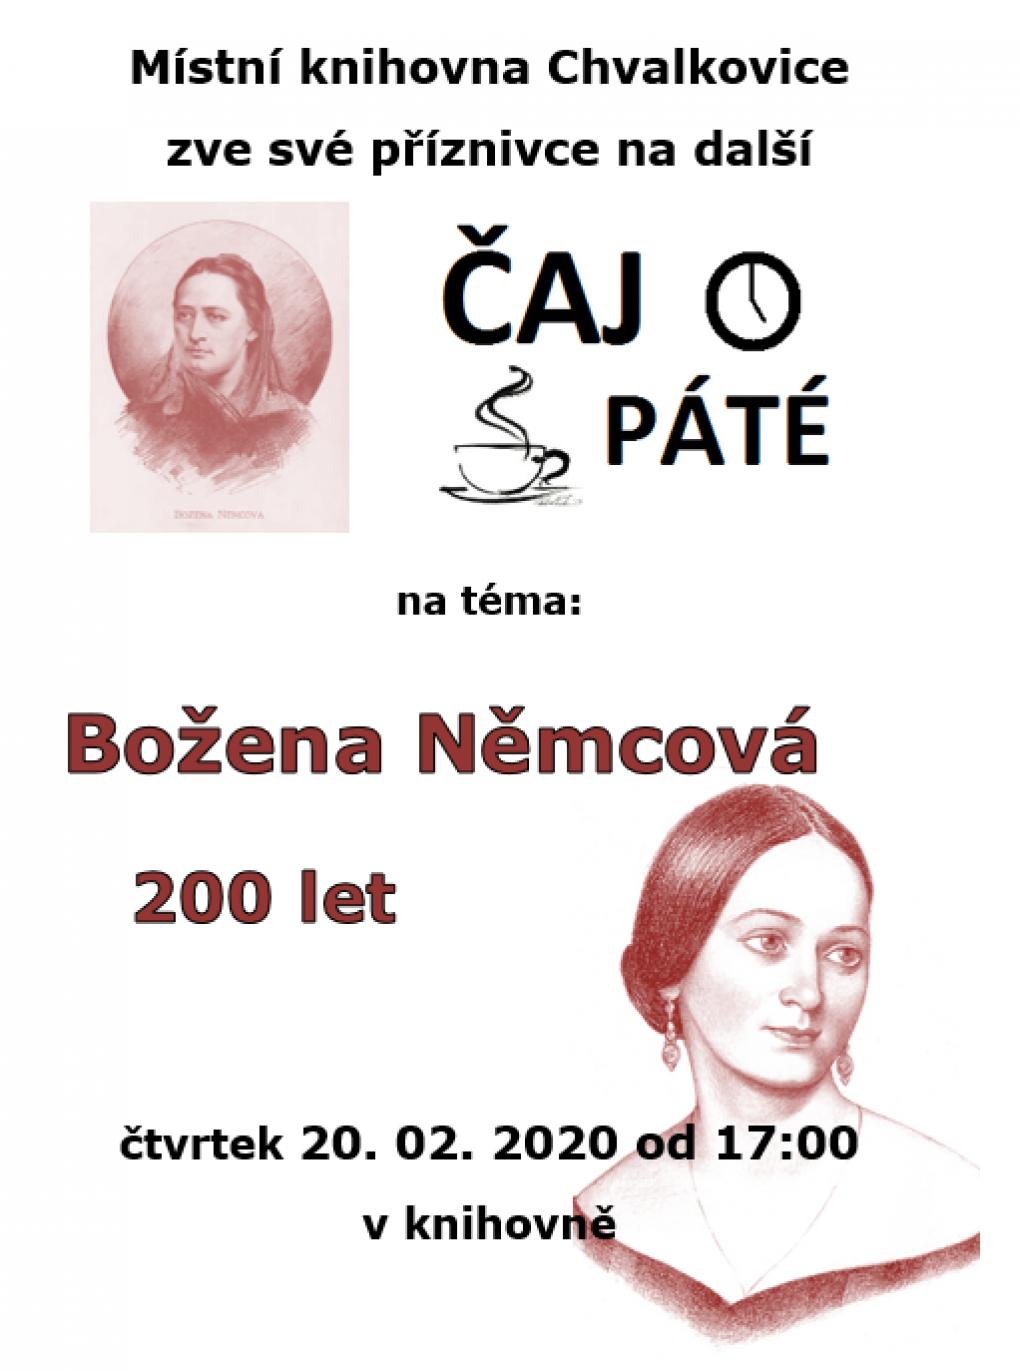 20200220_Caj_o_pate.png